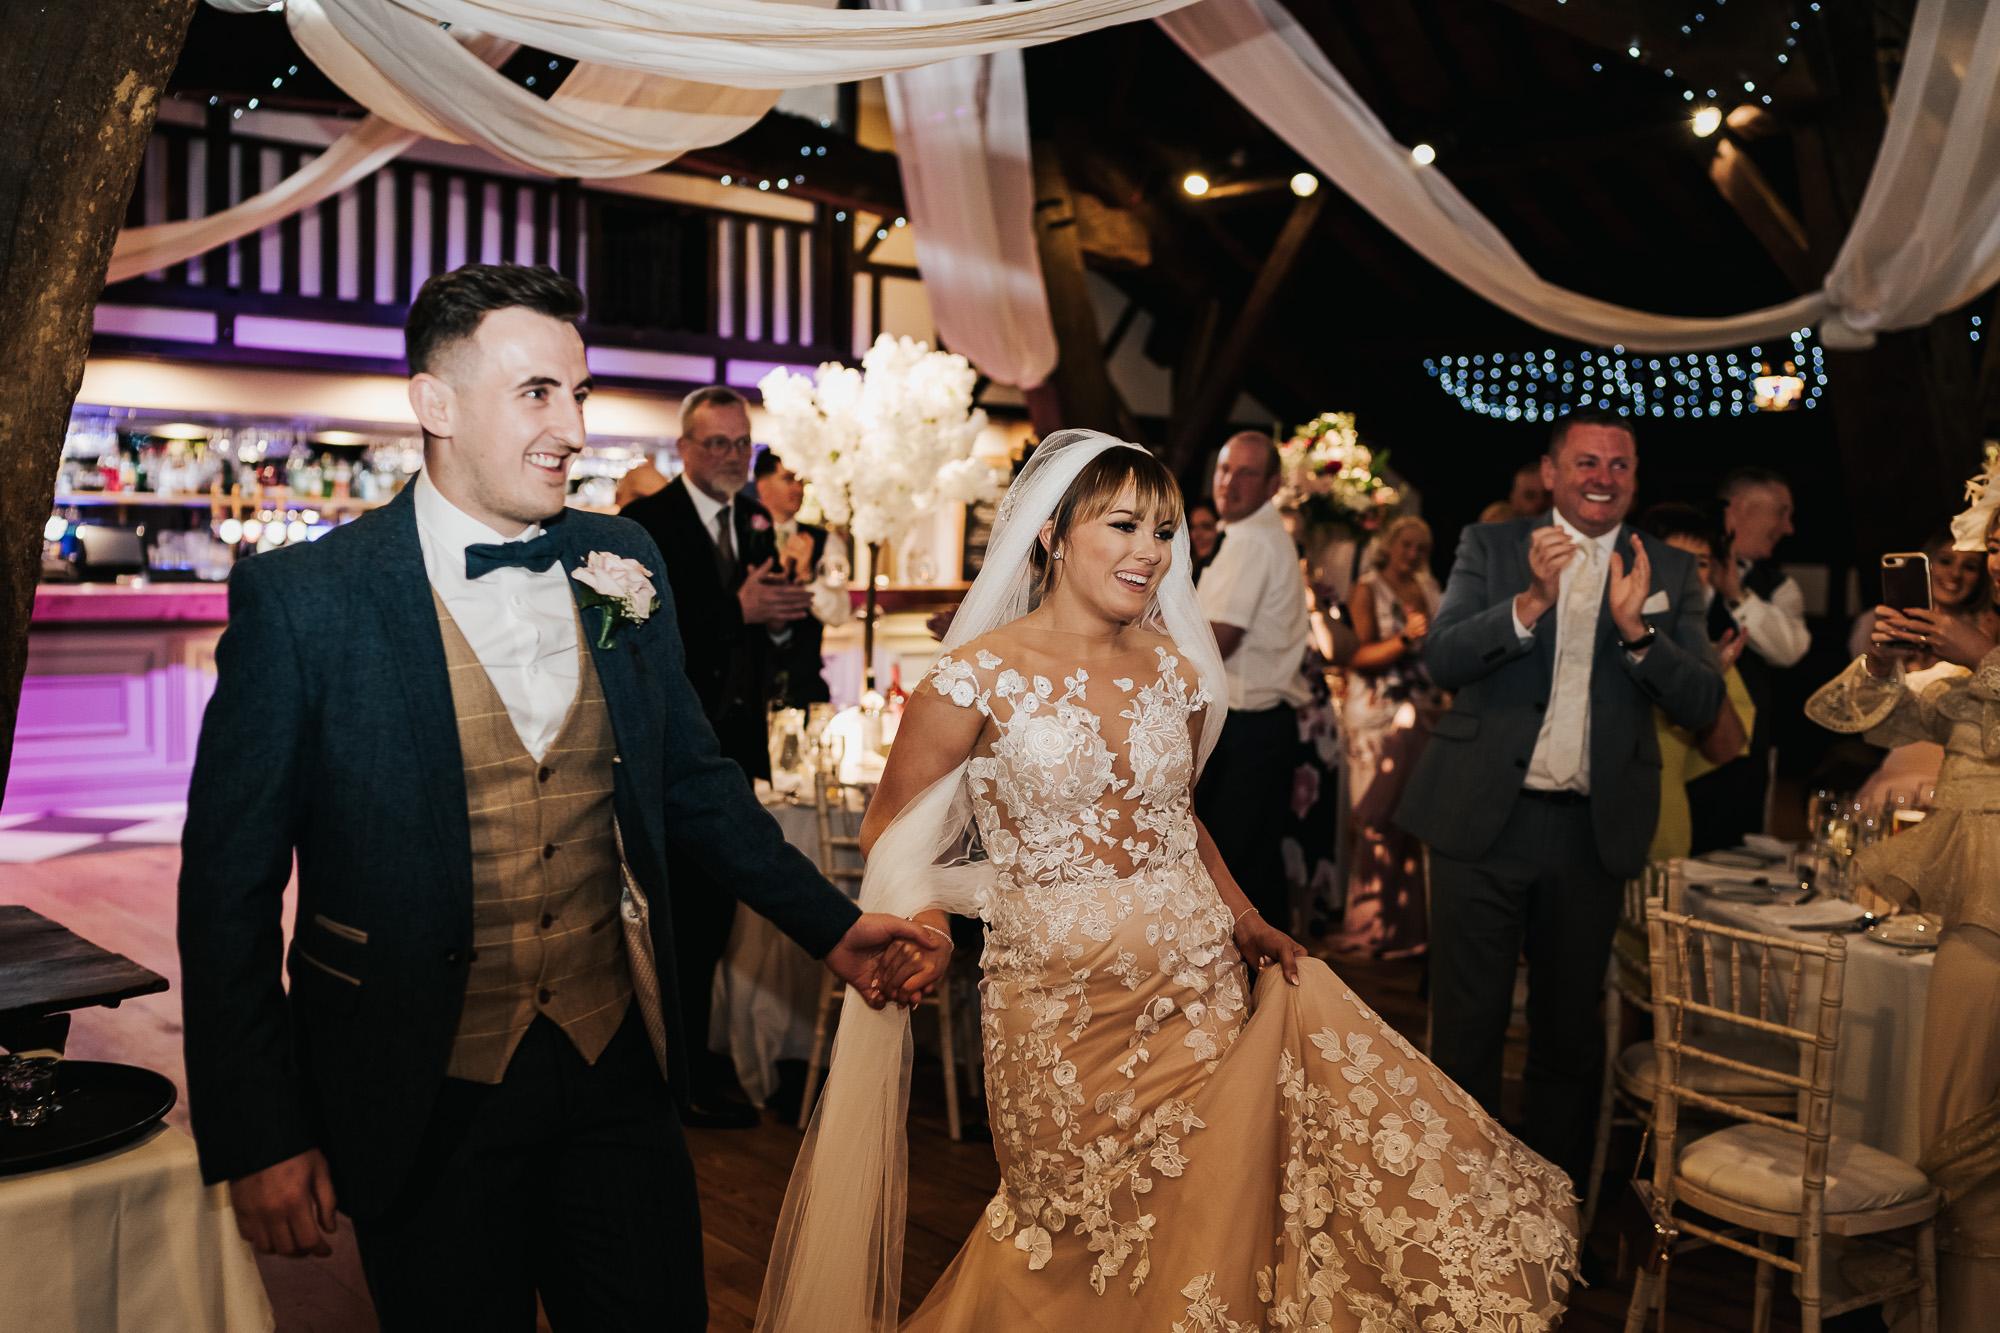 Rivington Hall Barn Wedding PHotographer lancashire wedding photography (27 of 34).jpg